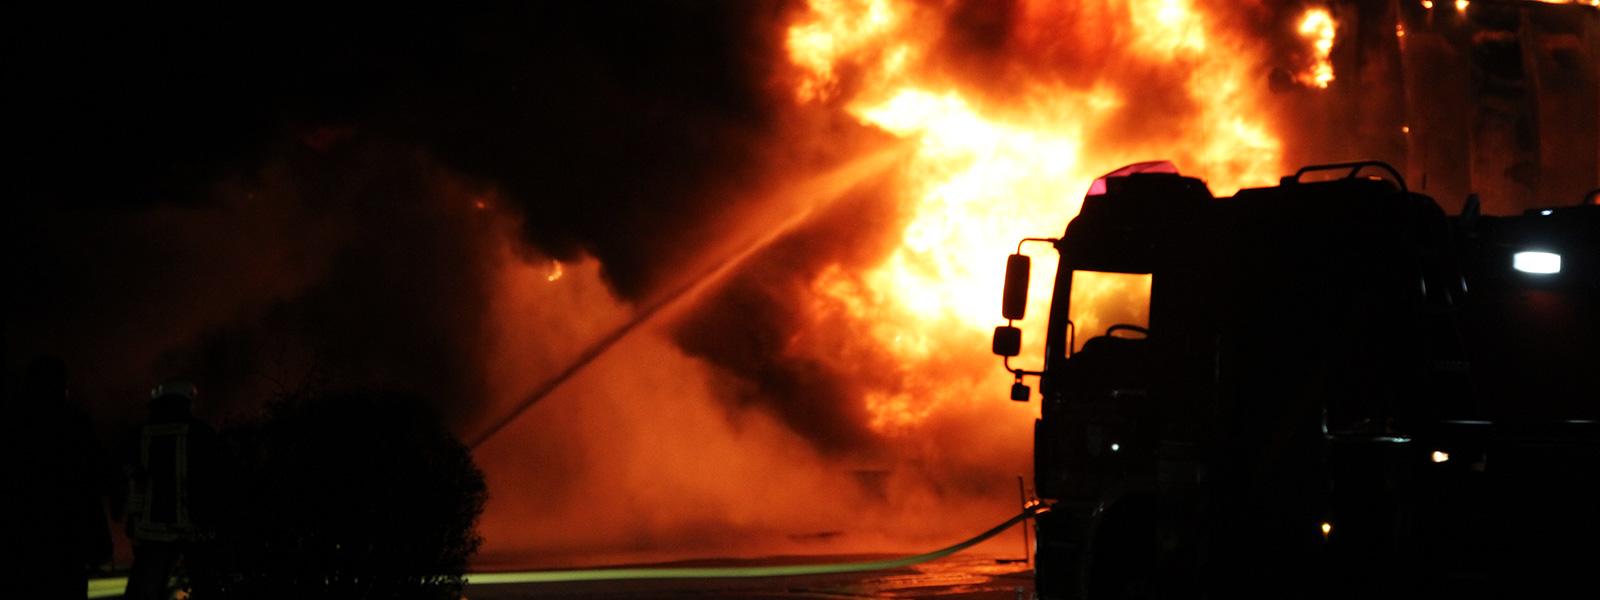 (c) Feuerwehr-sankt-augustin.de